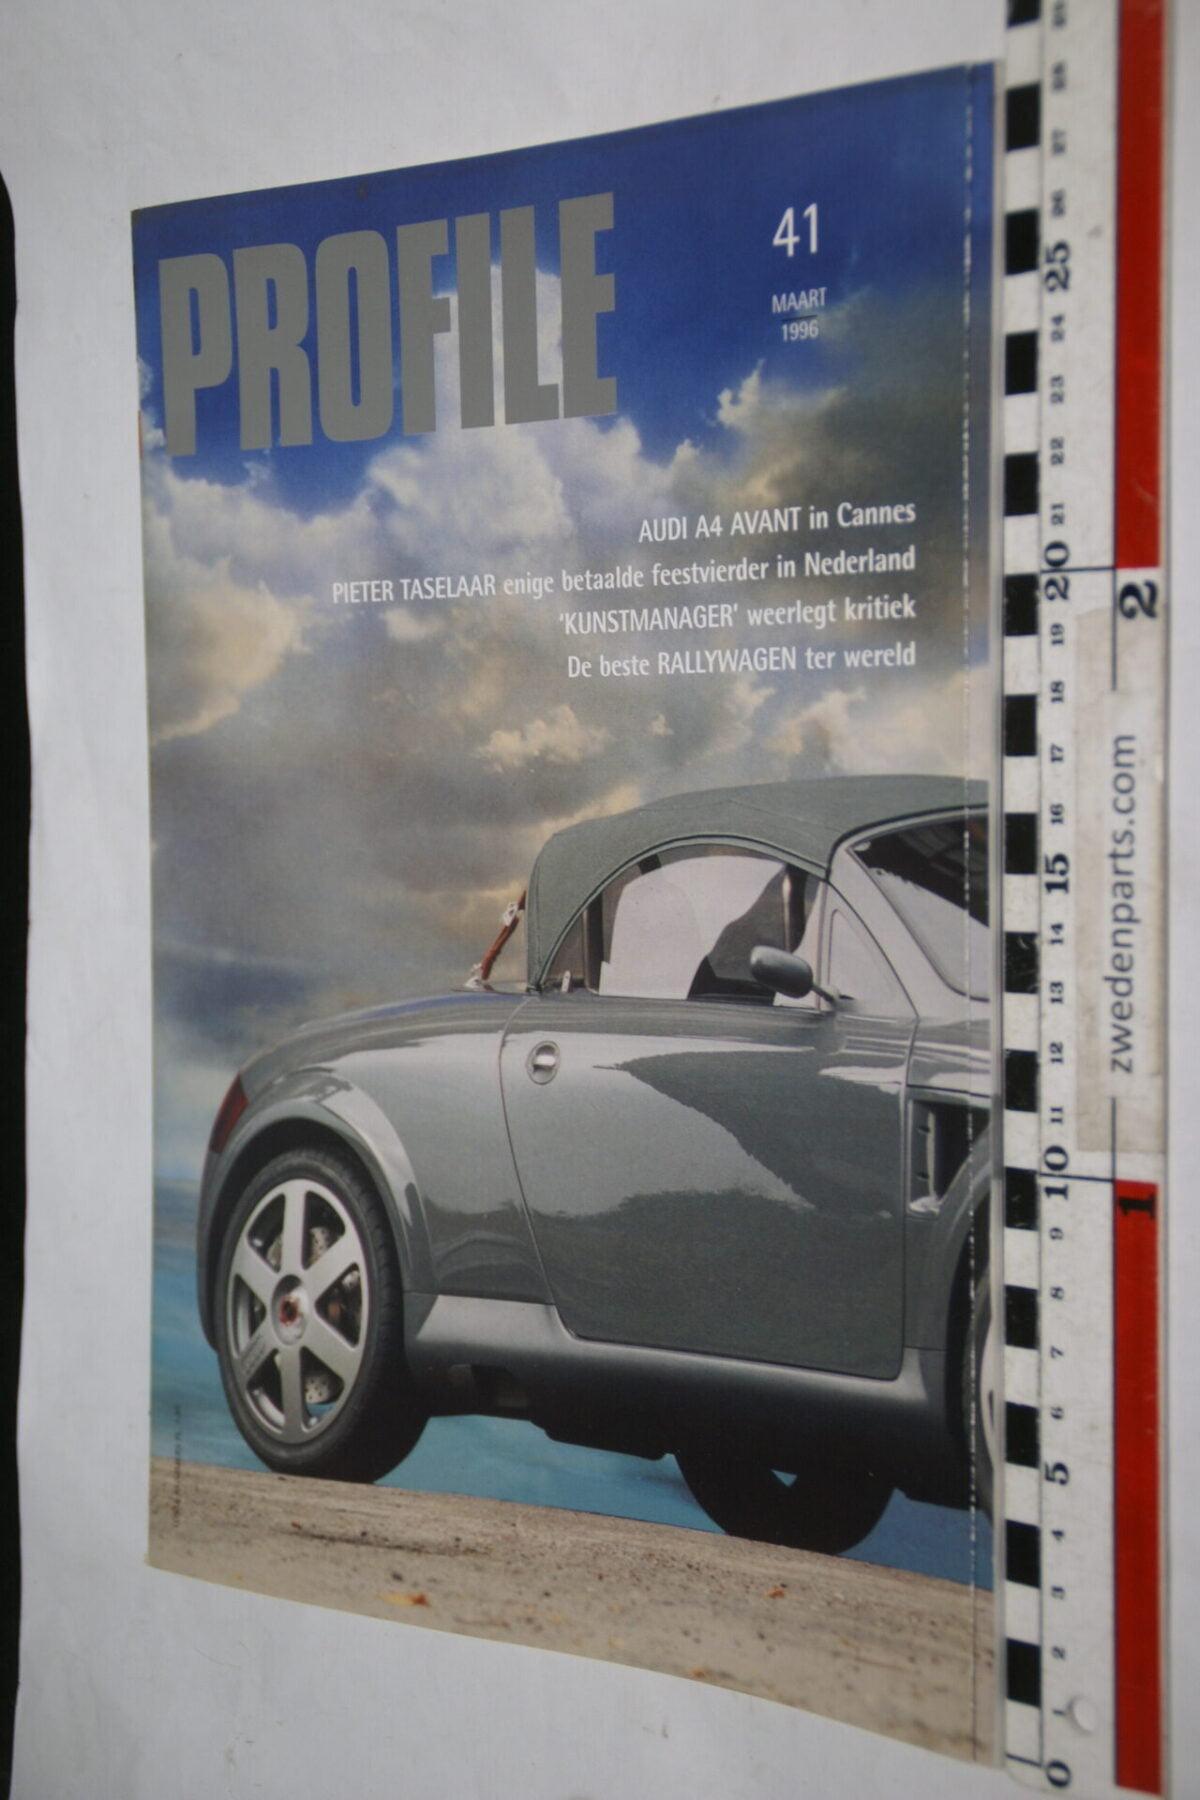 DSC01255 1996 maart tijdschrift Profile Audi Avant nr 41-e5011dcf